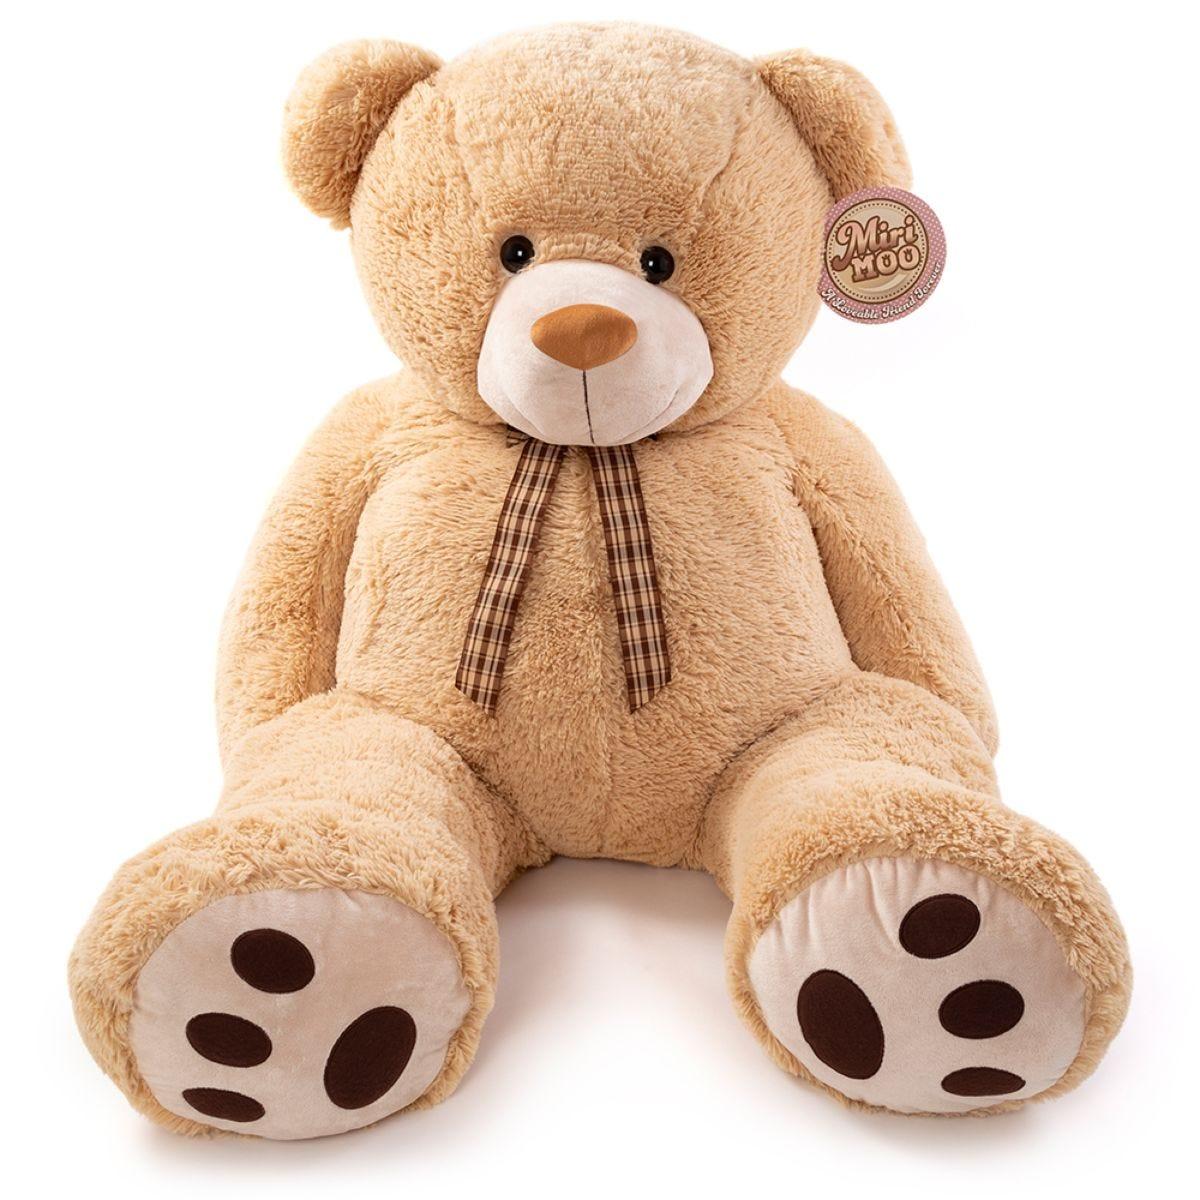 Miri Moo Giant 4ft Plush Albert Teddy Bear - Beige